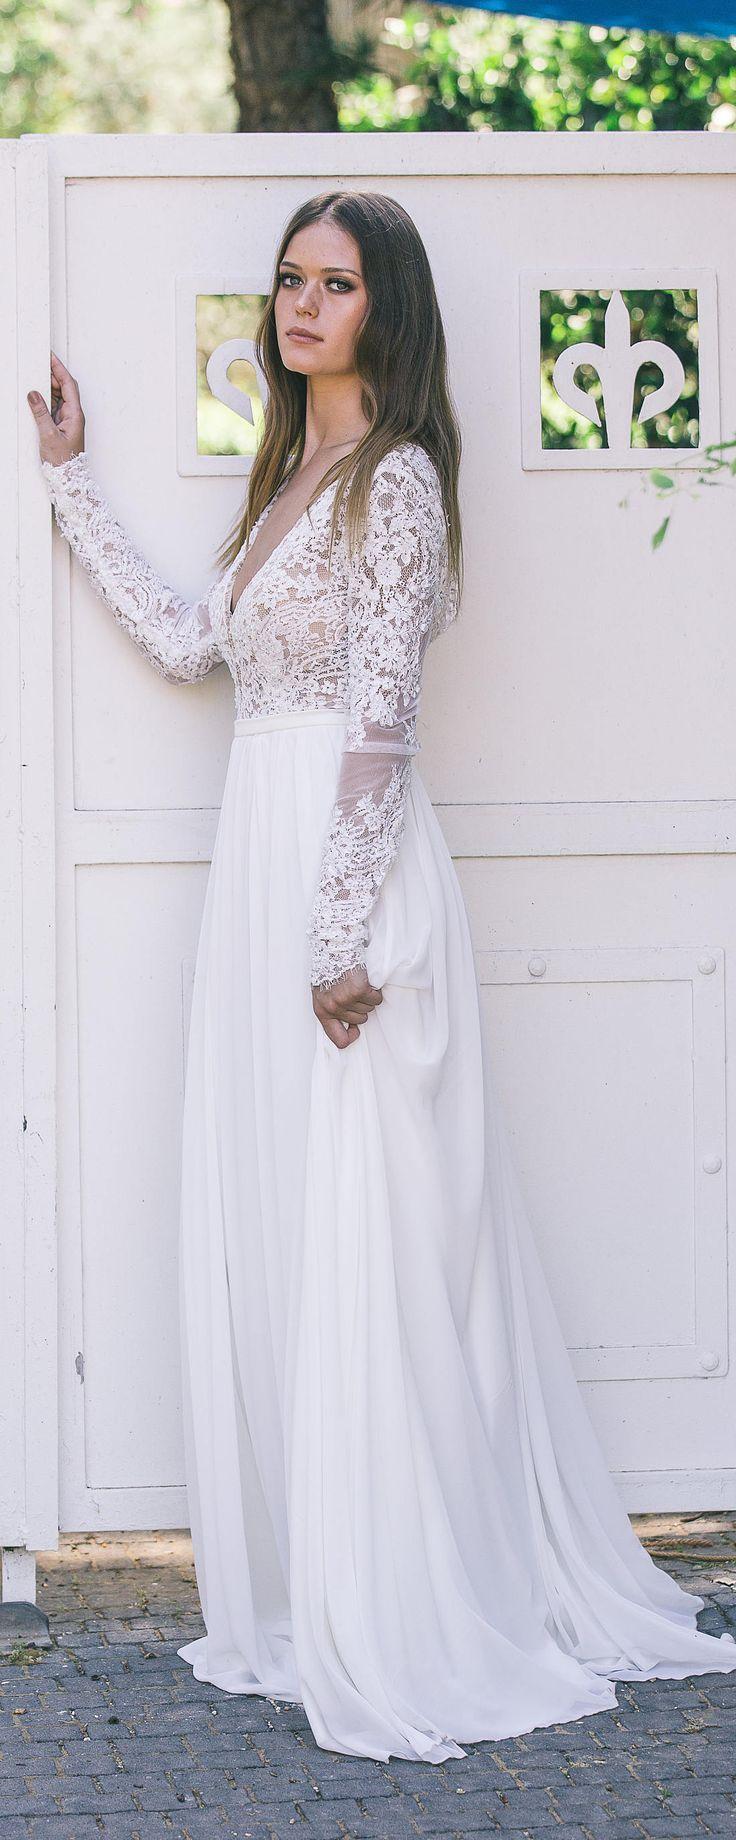 Mariage - Bohemian Wedding Dress, Boho Wedding Dress, Backless Wedding Dress, Long Sleeve Wedding Dress, Boho Long Sleeve Wedding Dress